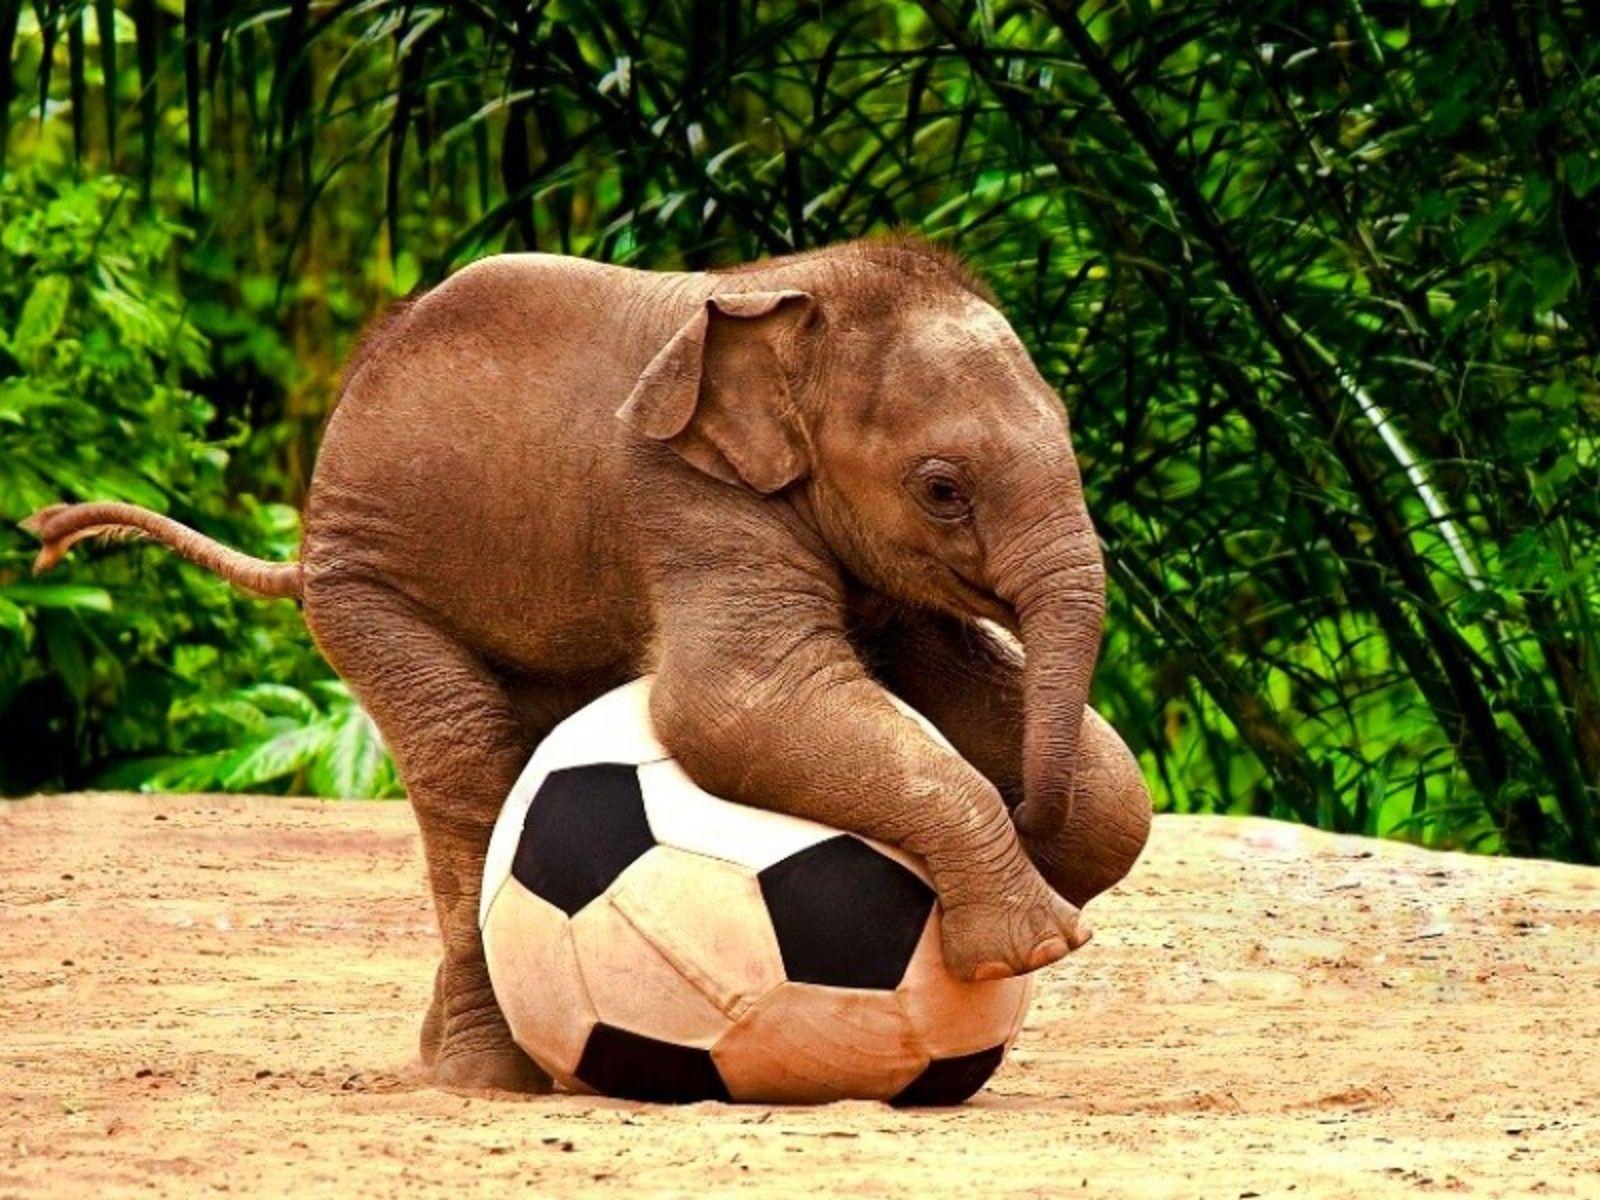 Http Www Wallneer Com Wp Content Uploads 2013 06 Baby Elephant Hd Wallpaper Jpg Elephants Playing Cute Animals Animals Beautiful